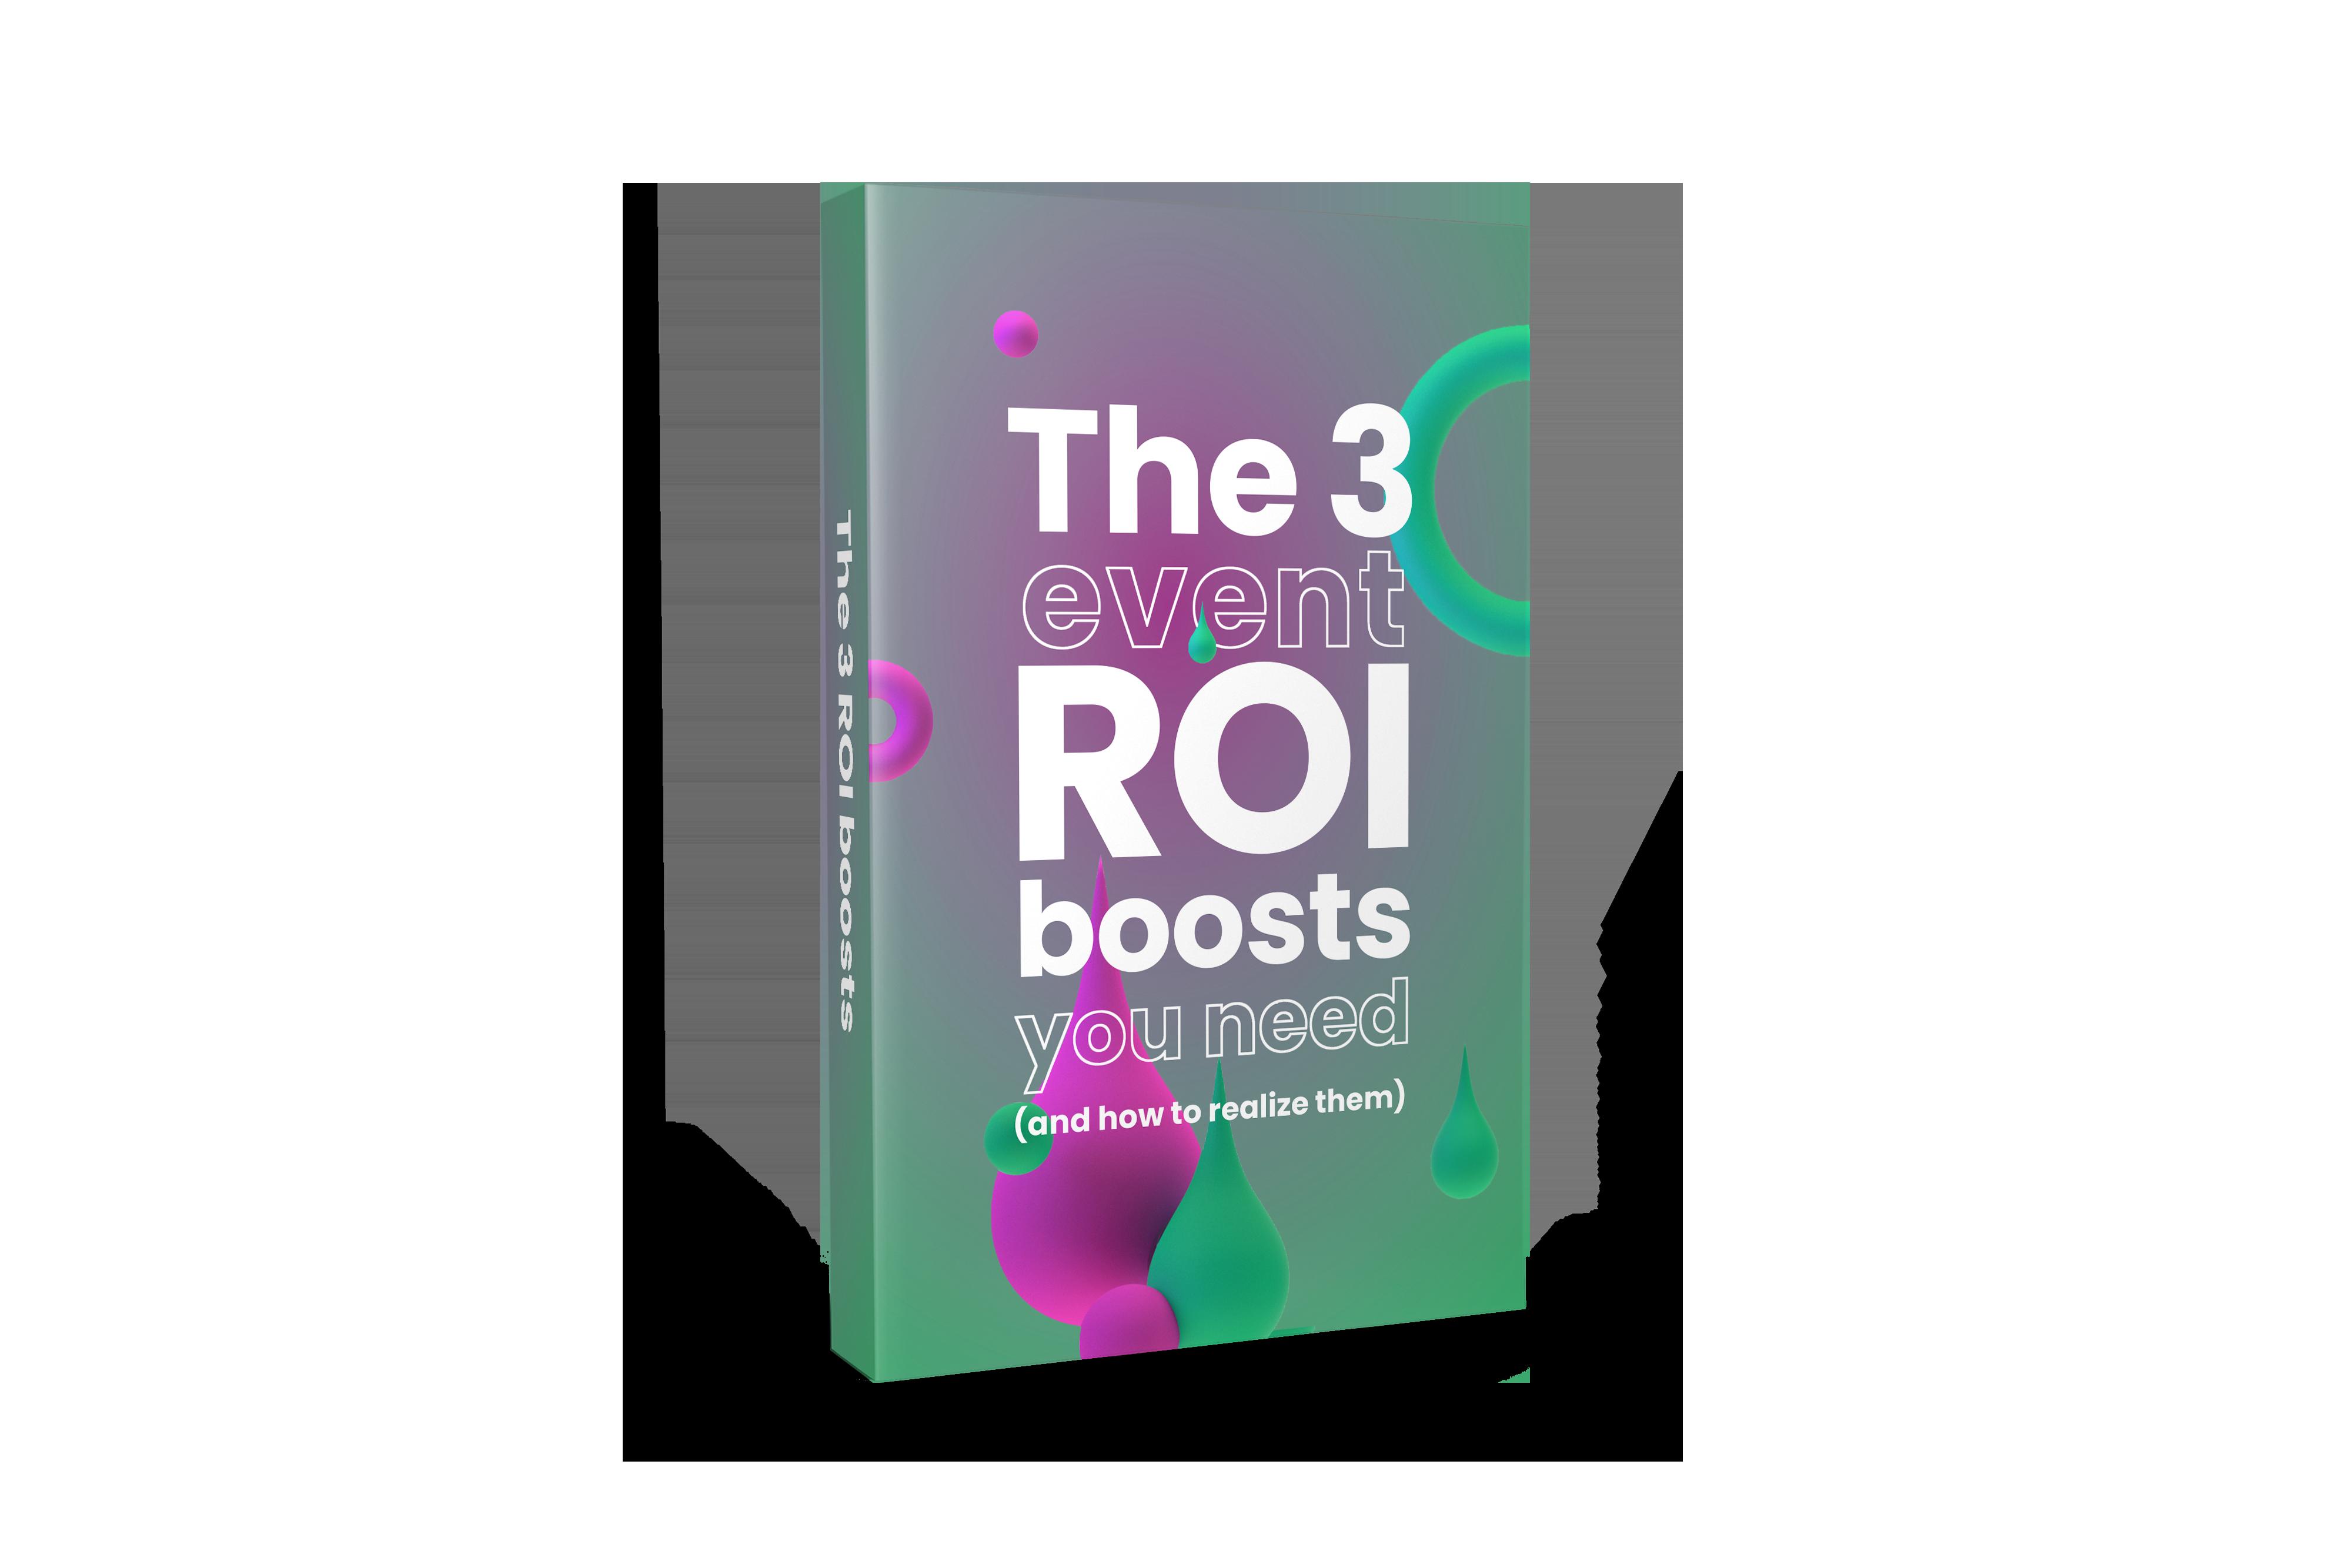 ROI_ebook_cover